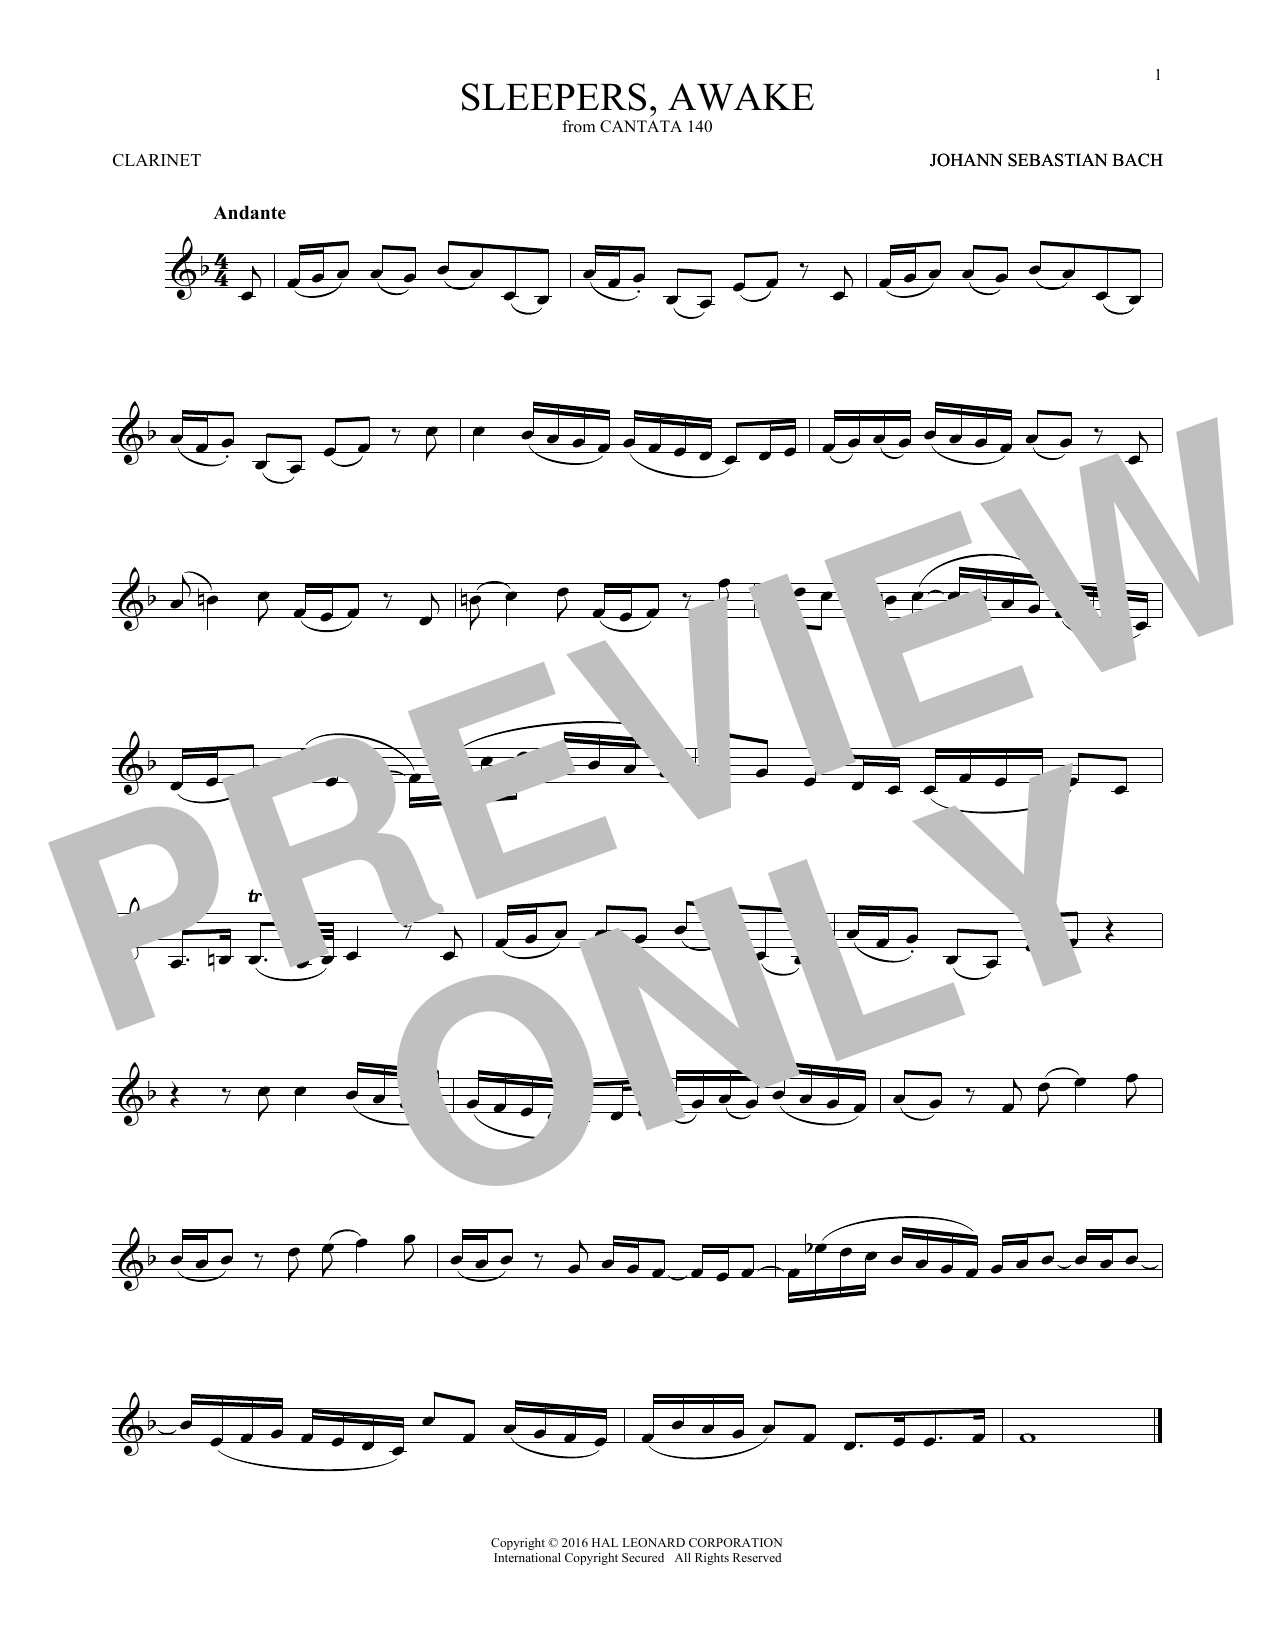 Sleepers, Awake (Wachet Auf) (Clarinet Solo)